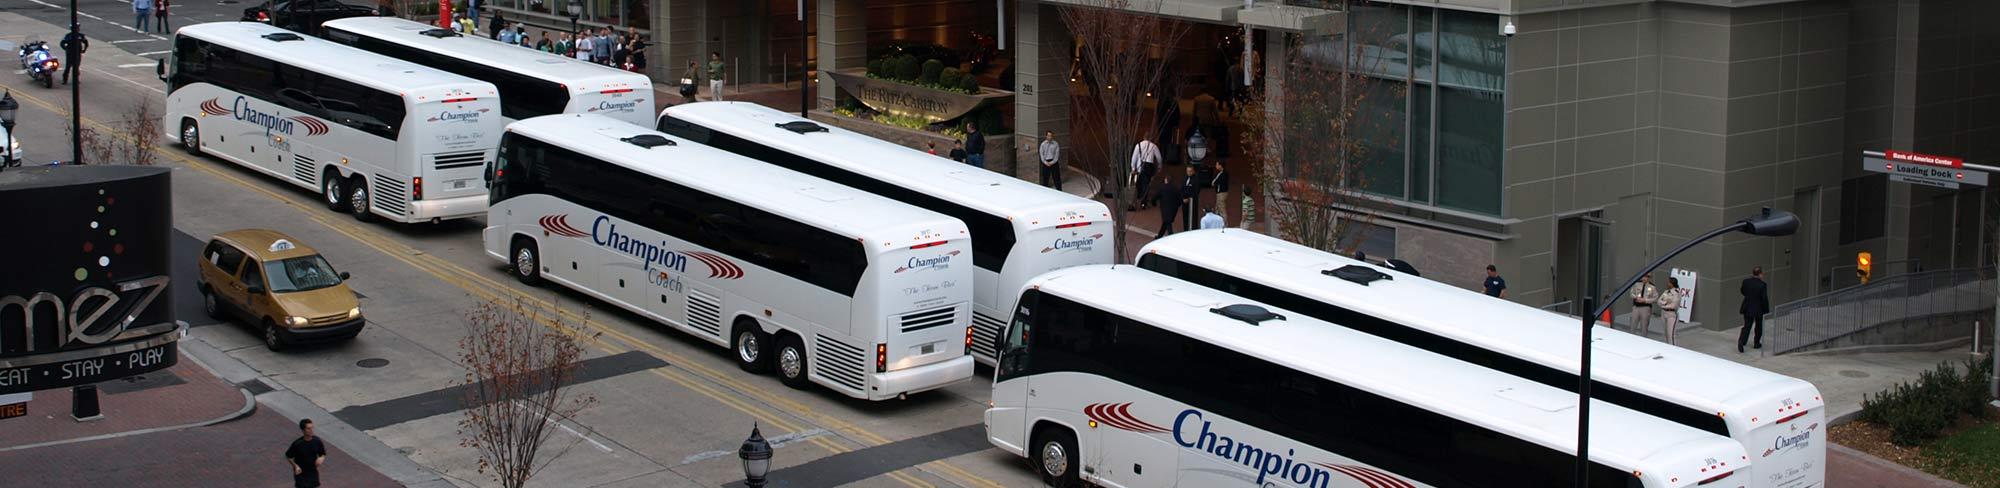 Champion Coach Corporate Travel